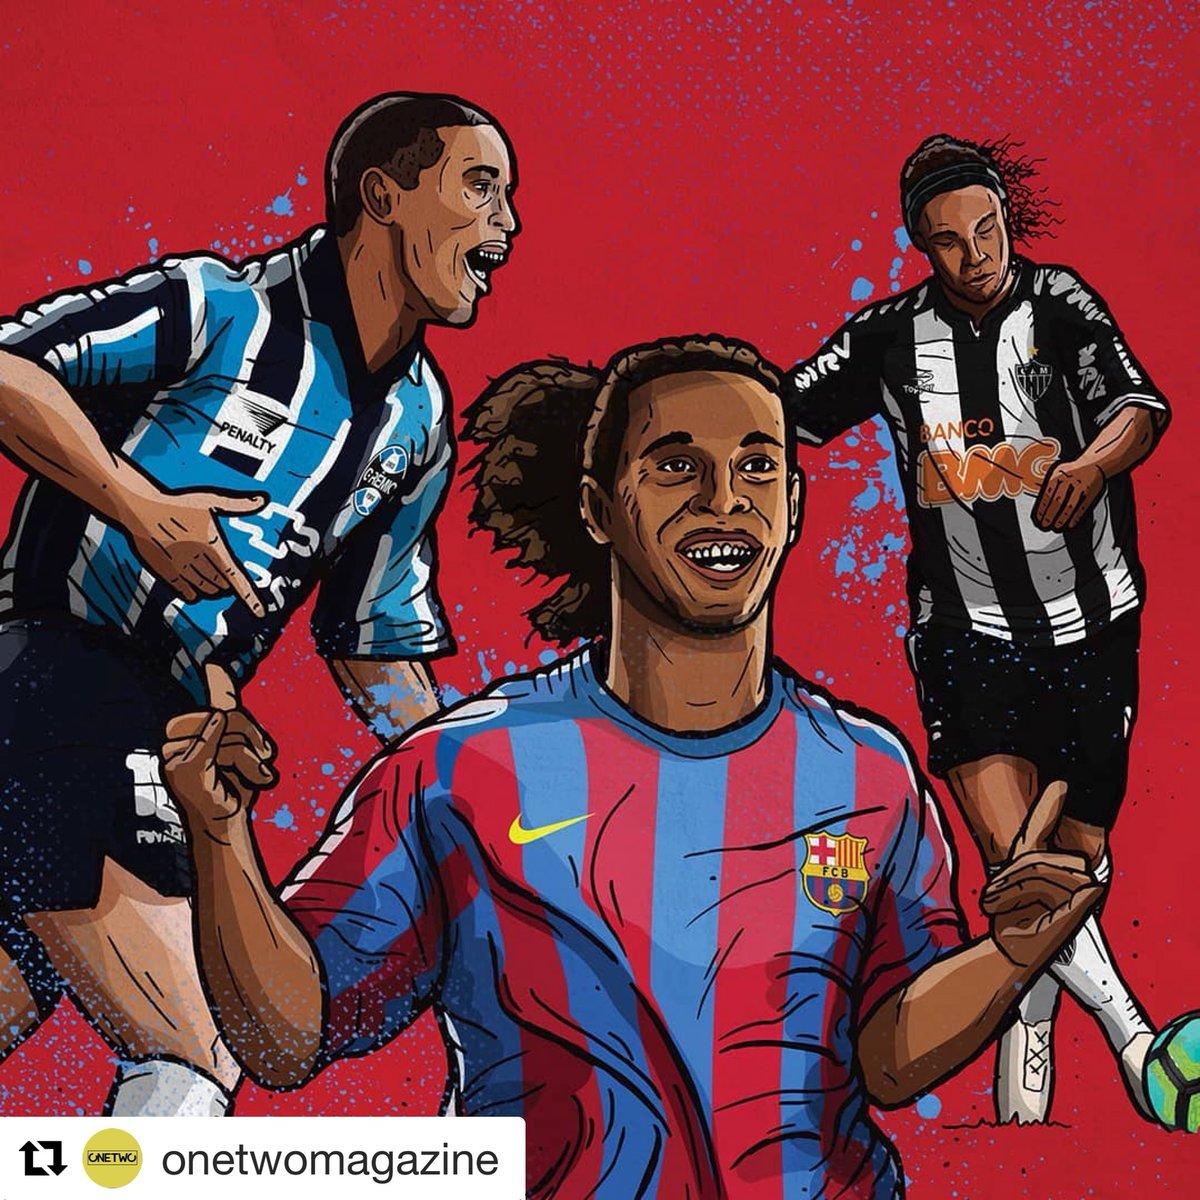 Recent work for @onetwomagazine of the great man himself @10Ronaldinho  #ronaldinho #FCBarcelona #Gremio #Minero #Brazil #footballart #illustration #onetwomagazine<br>http://pic.twitter.com/D7VA0vUDep